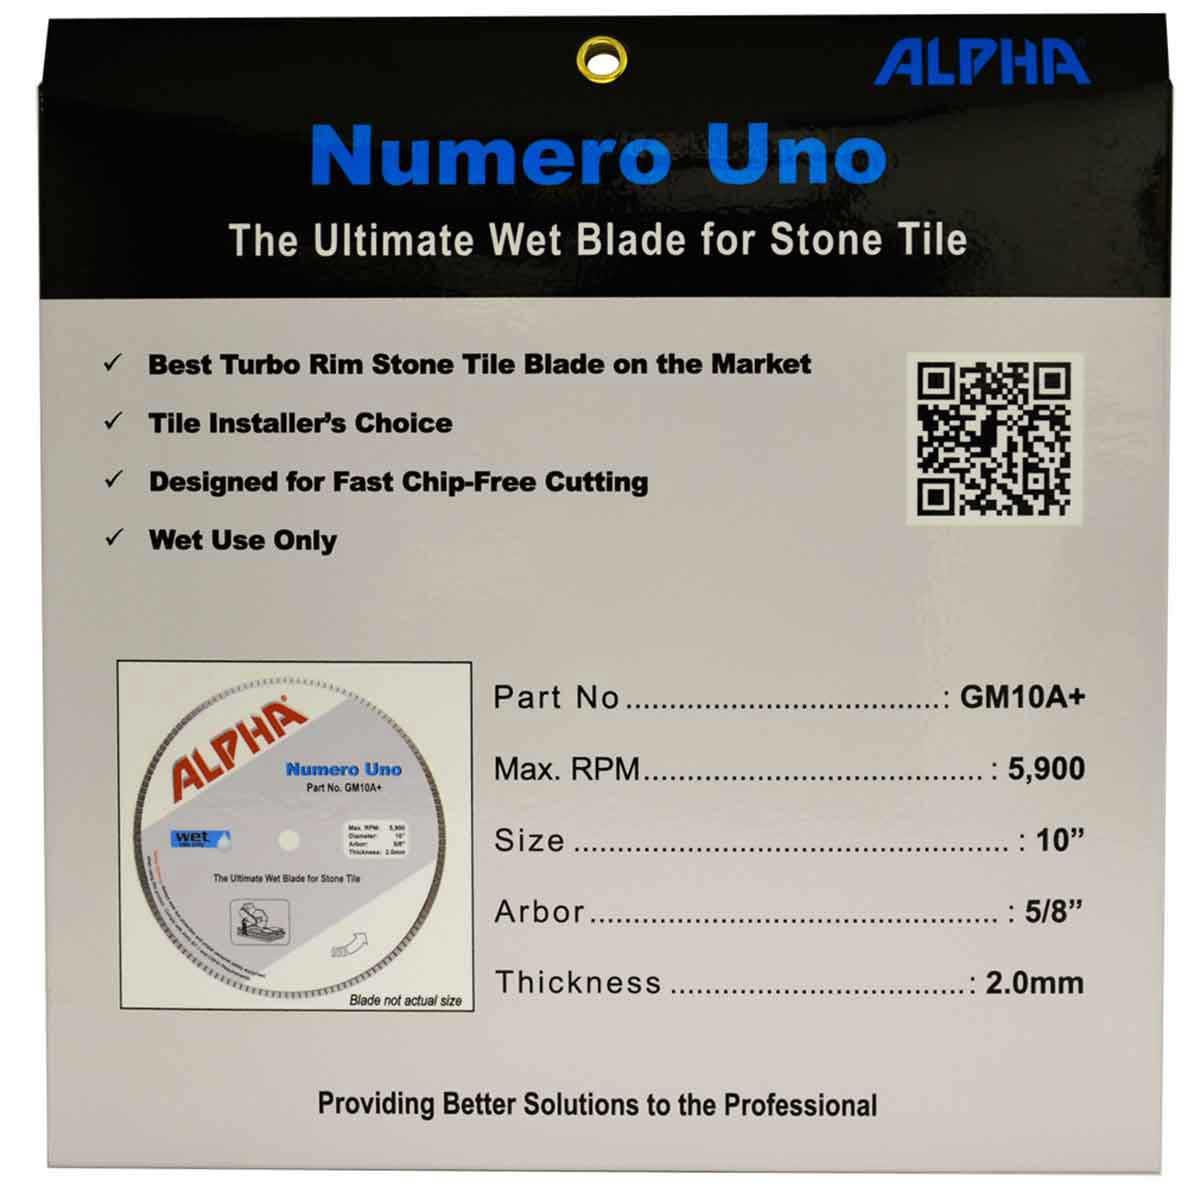 alpha numero uno diamond blade packaging